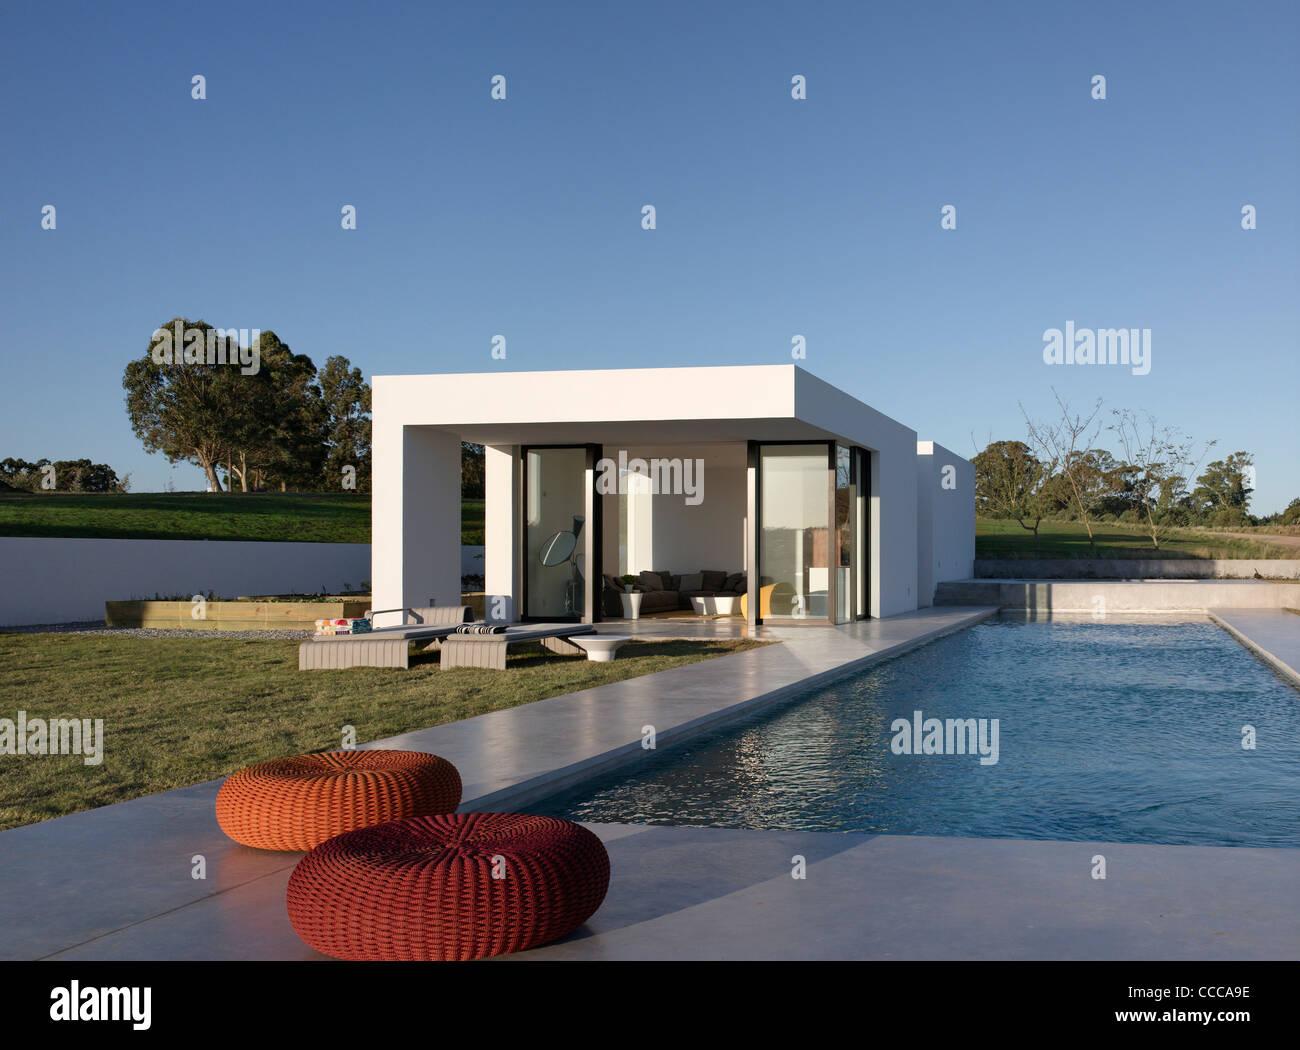 House 10/ Chacra 10, Kallosturin, Villalagos Estate, Punta del Este, Uruguay, 2011, swimming pool and poolhouse - Stock Image